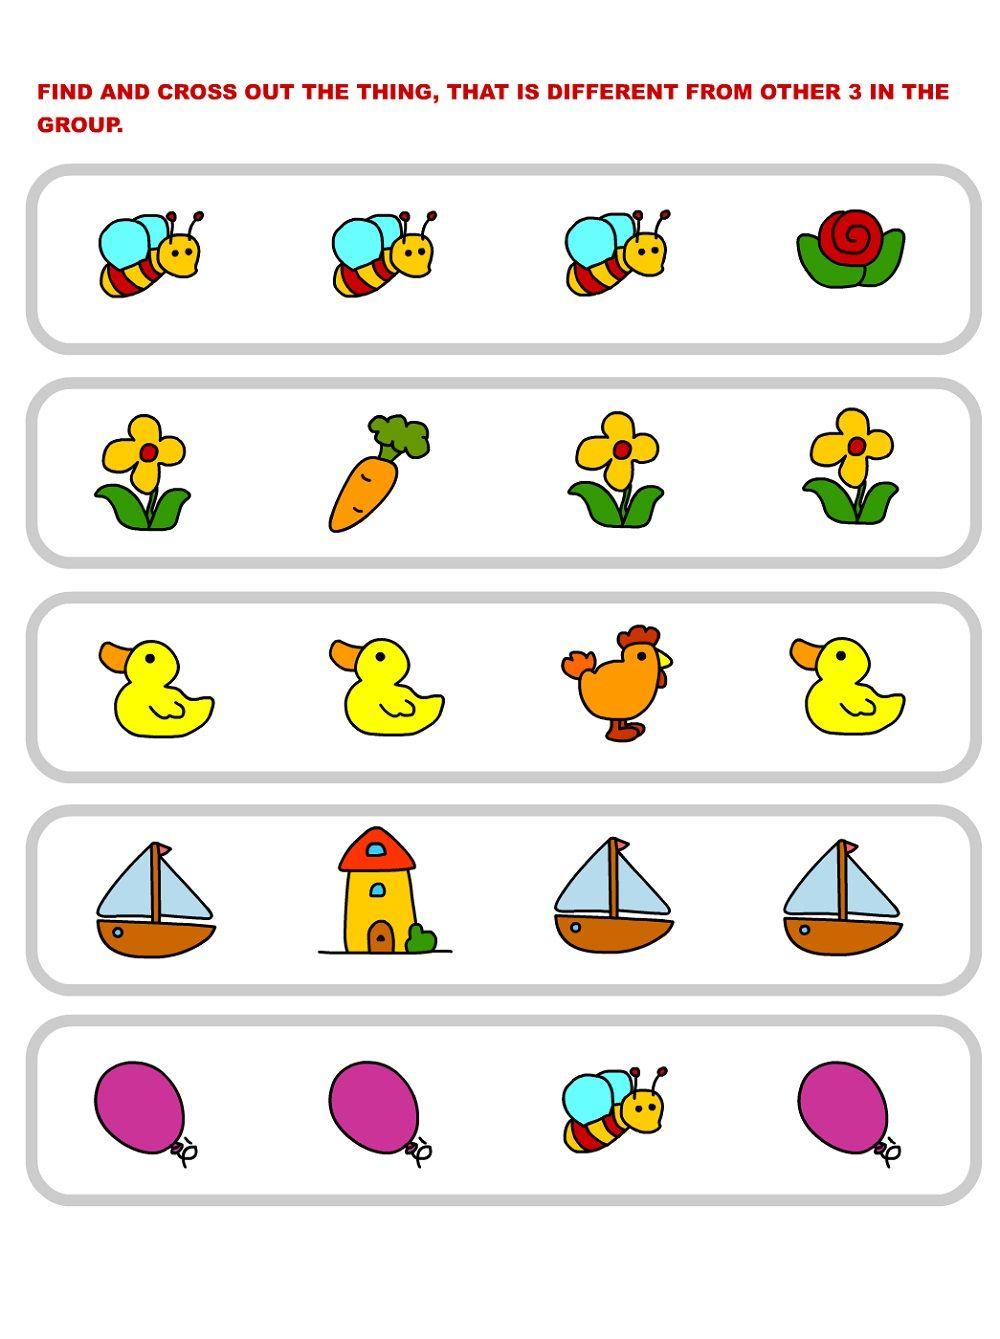 Same Or Different Worksheets Printable Fun Worksheets For Kids Worksheets For Kids Fun Worksheets [ 1339 x 1000 Pixel ]